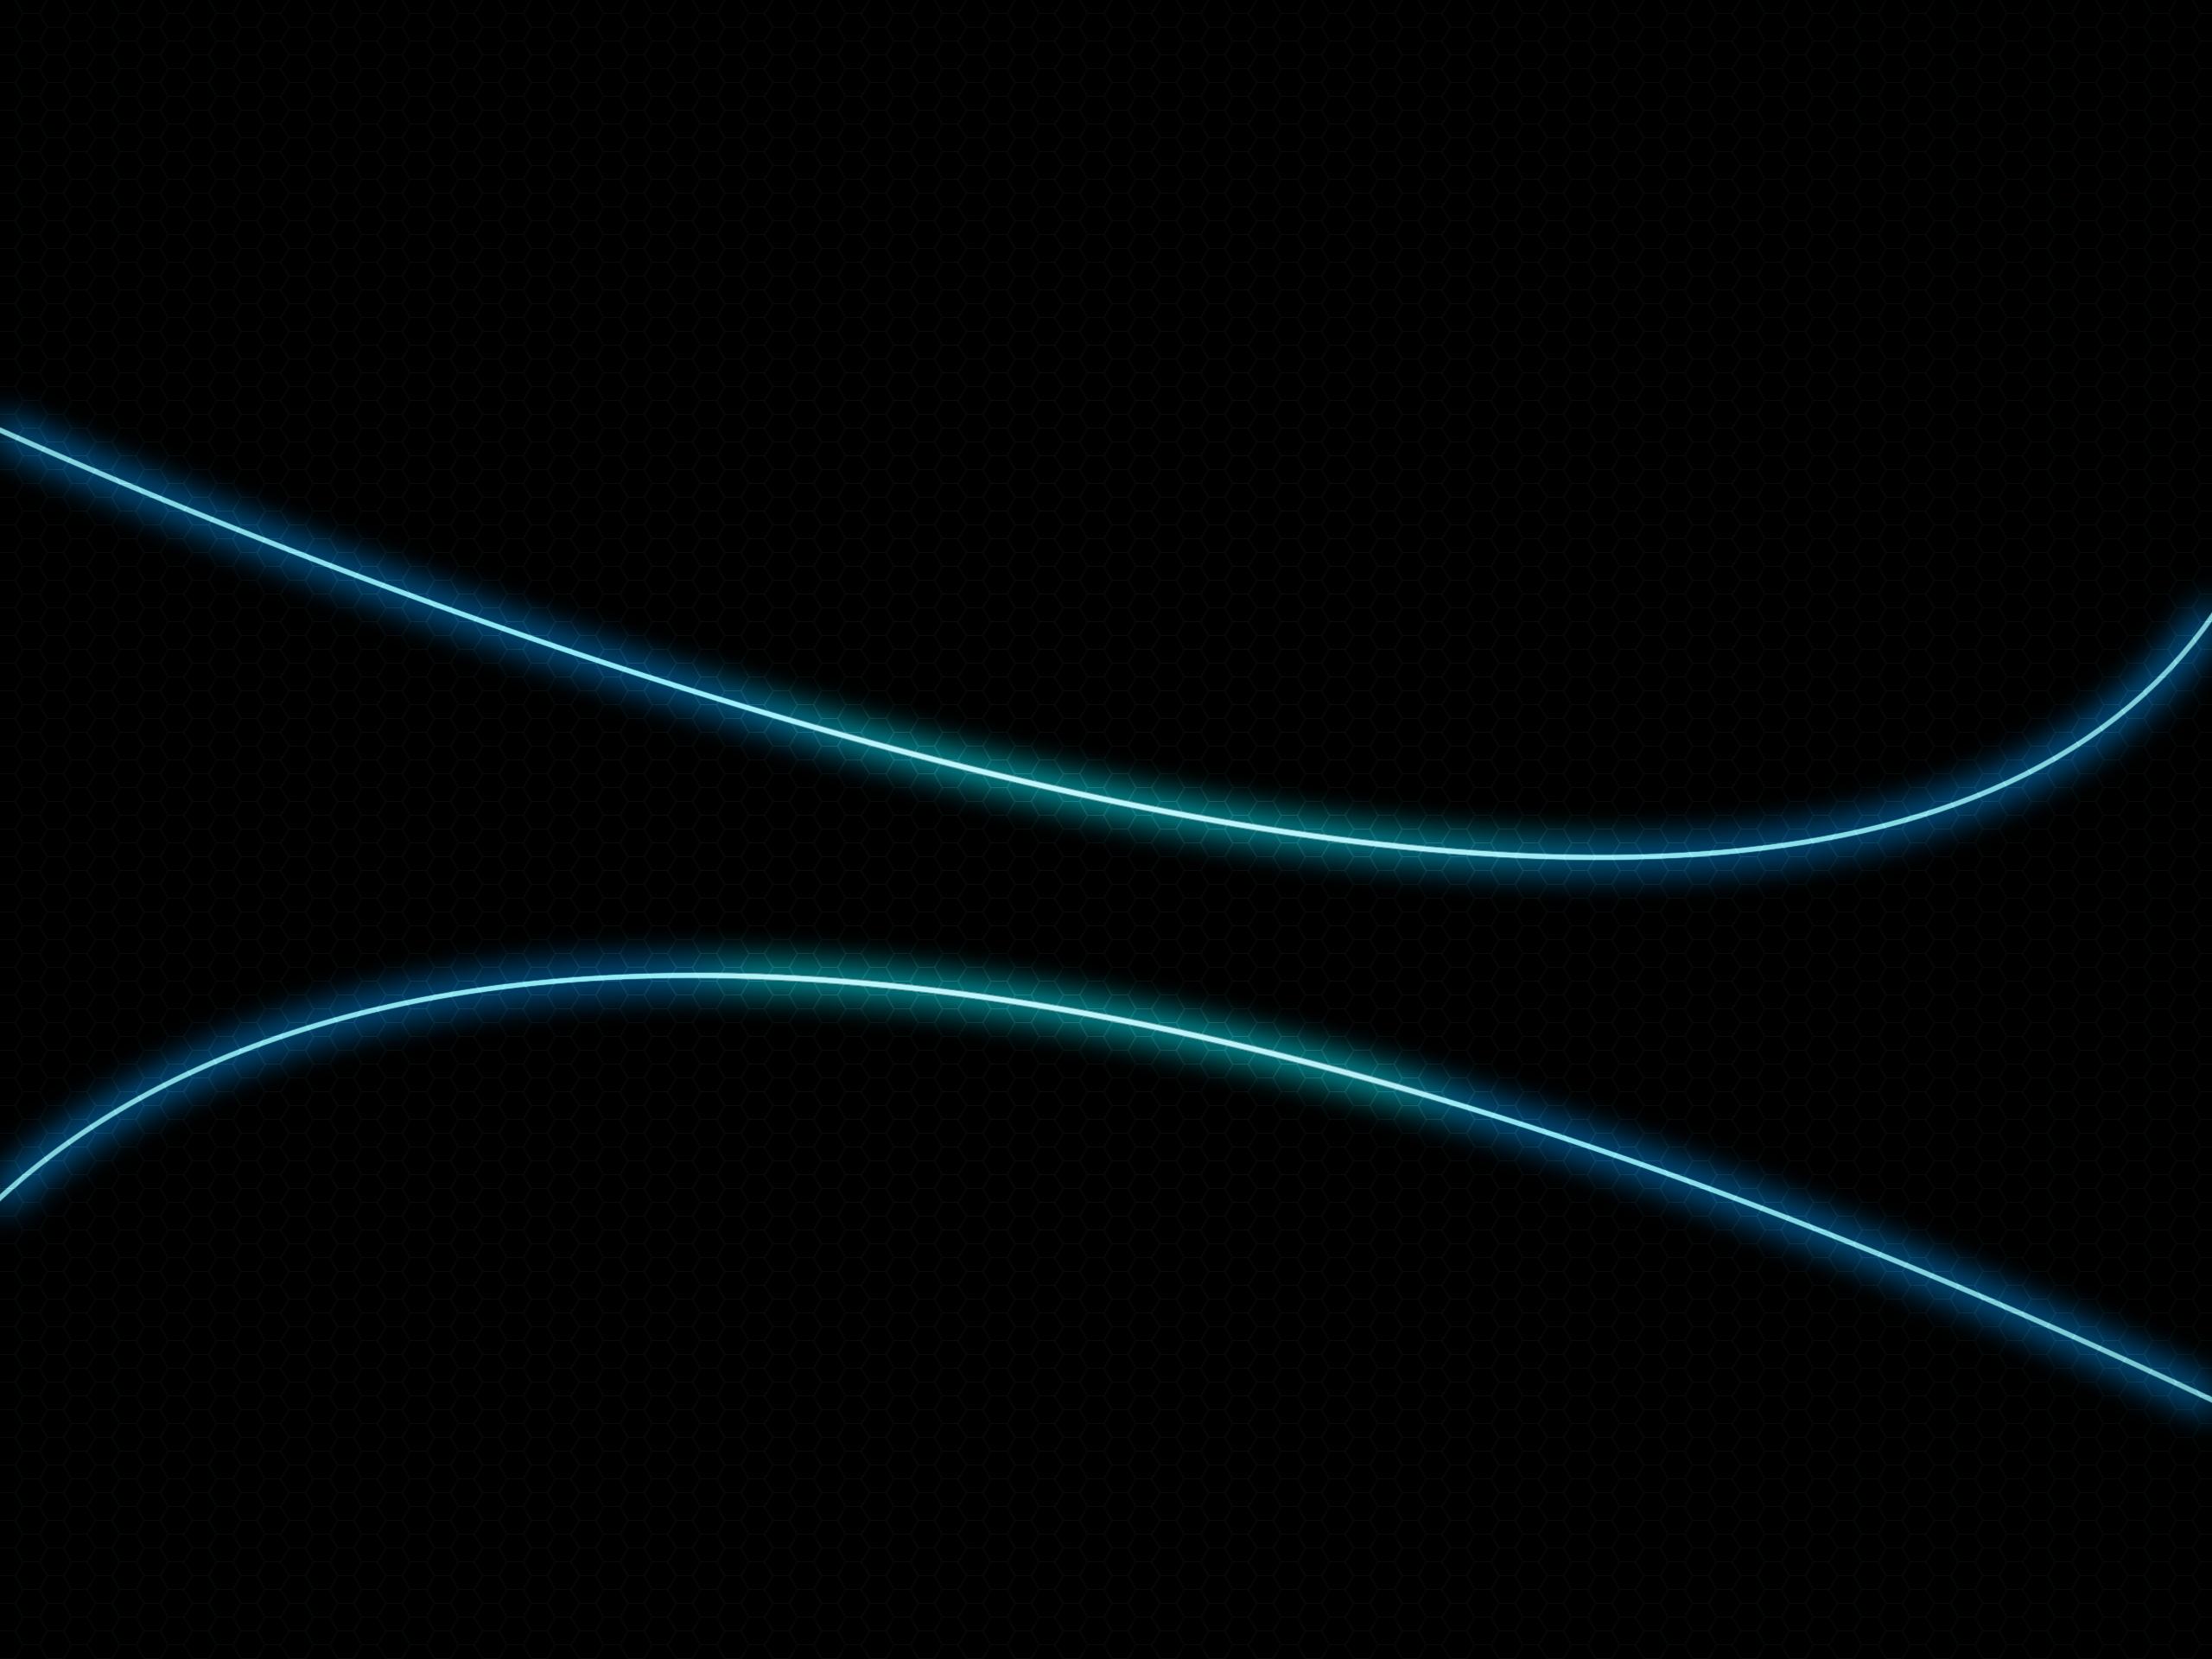 blue neon wallpaper by sapphirepsg on deviantart